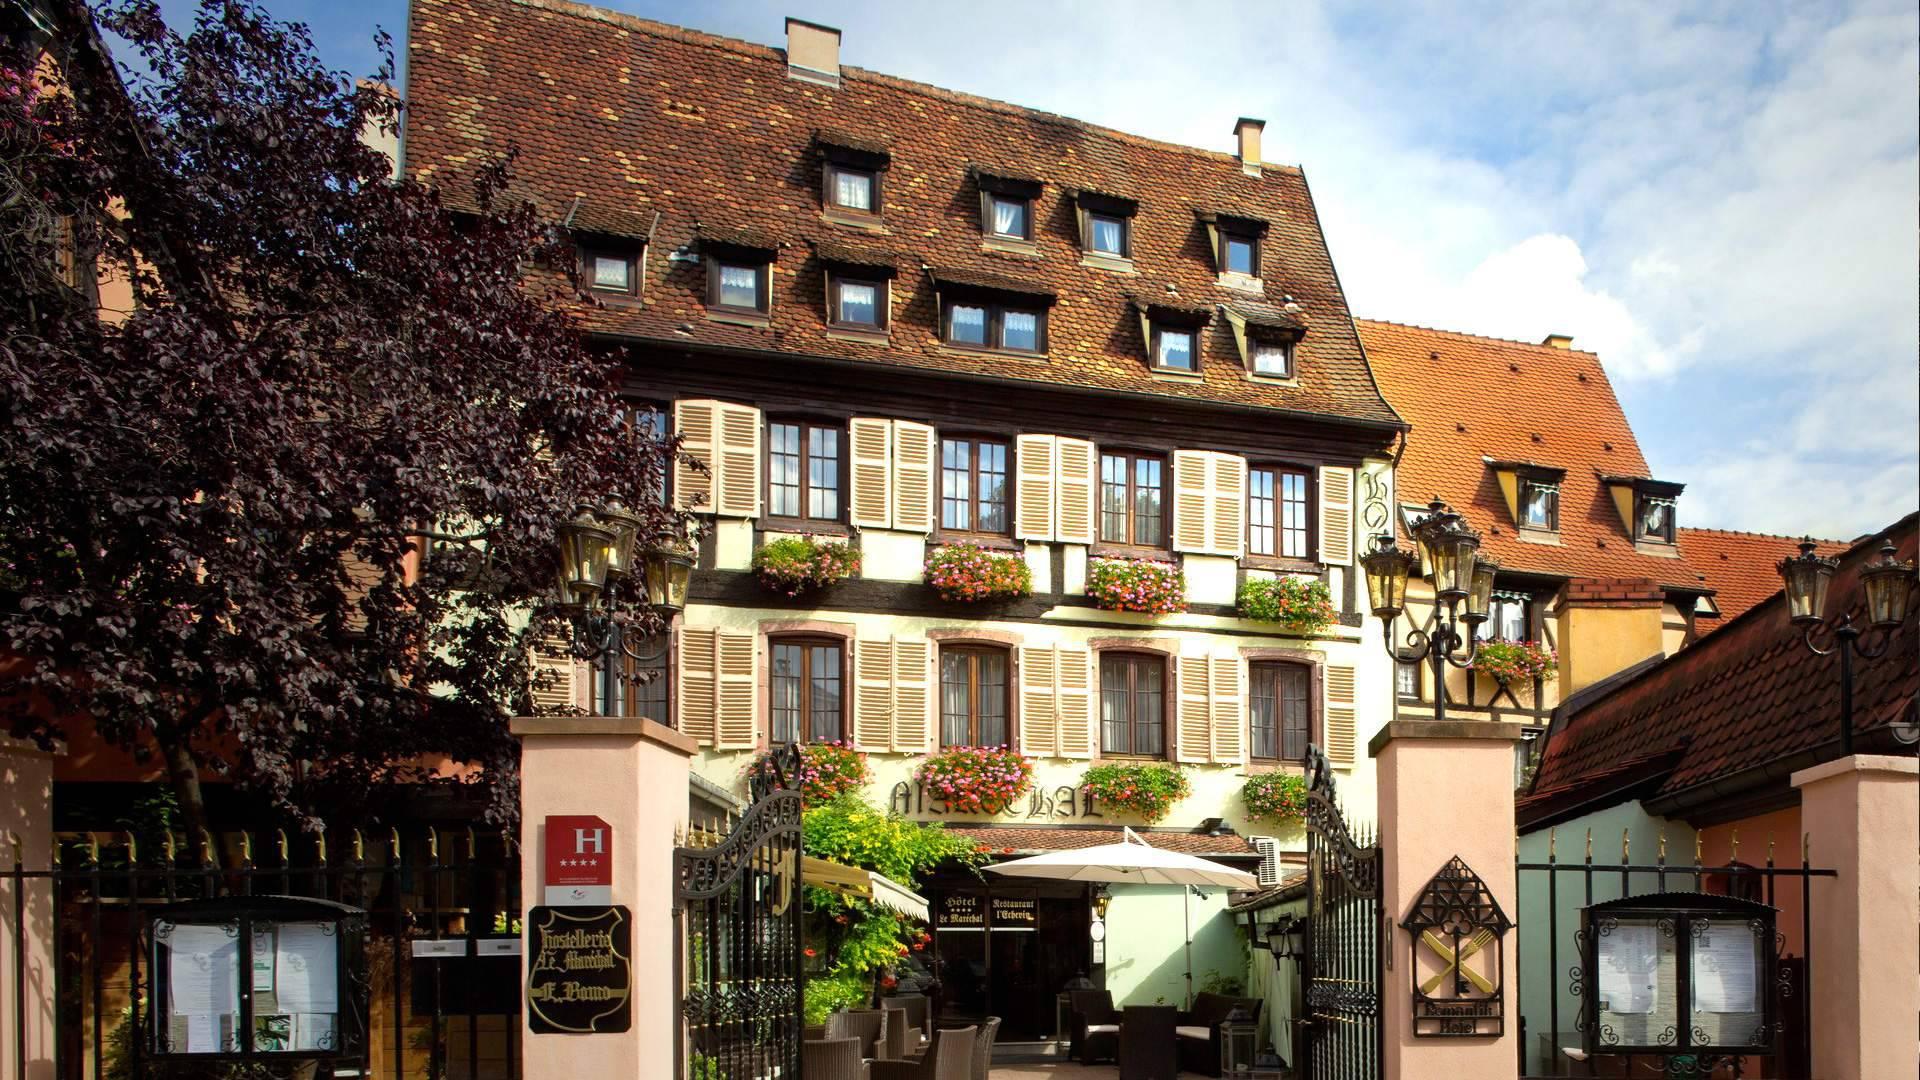 Le Marechal Luxury Hotel In Colmar France Alsace